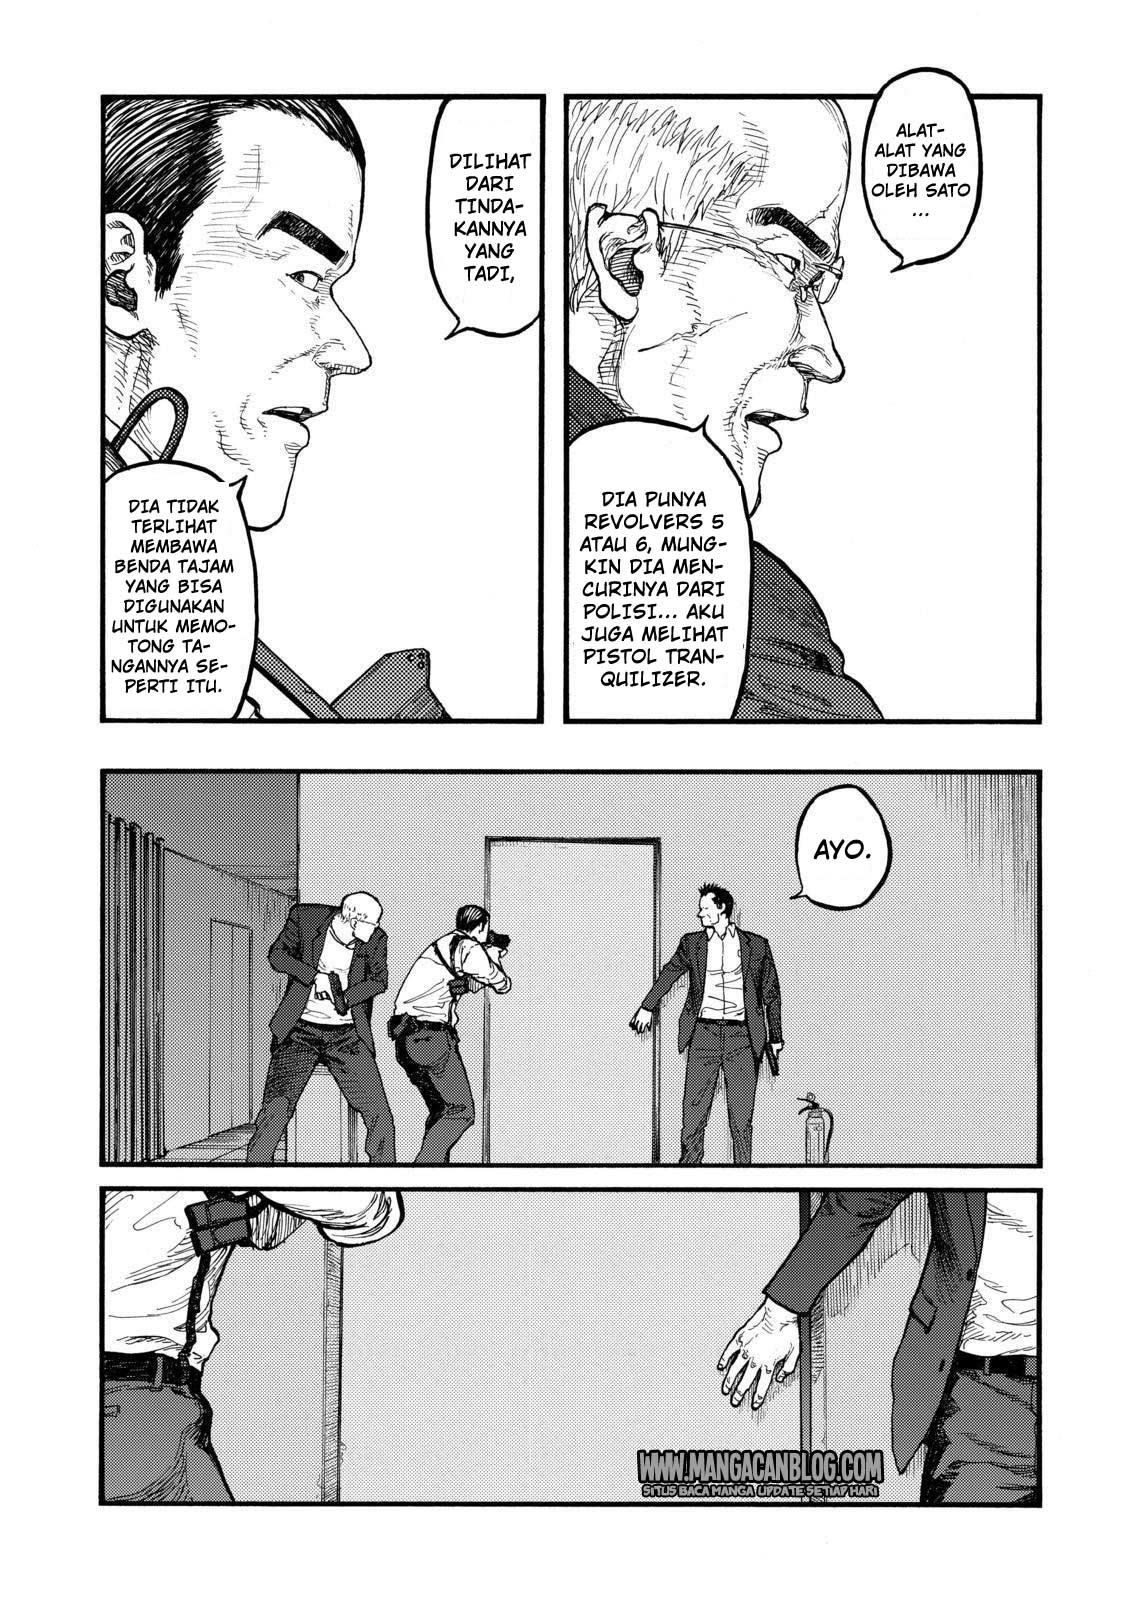 Dilarang COPAS - situs resmi www.mangacanblog.com - Komik ajin 039 - garis keras medan pertempuran 2 40 Indonesia ajin 039 - garis keras medan pertempuran 2 Terbaru 8|Baca Manga Komik Indonesia|Mangacan